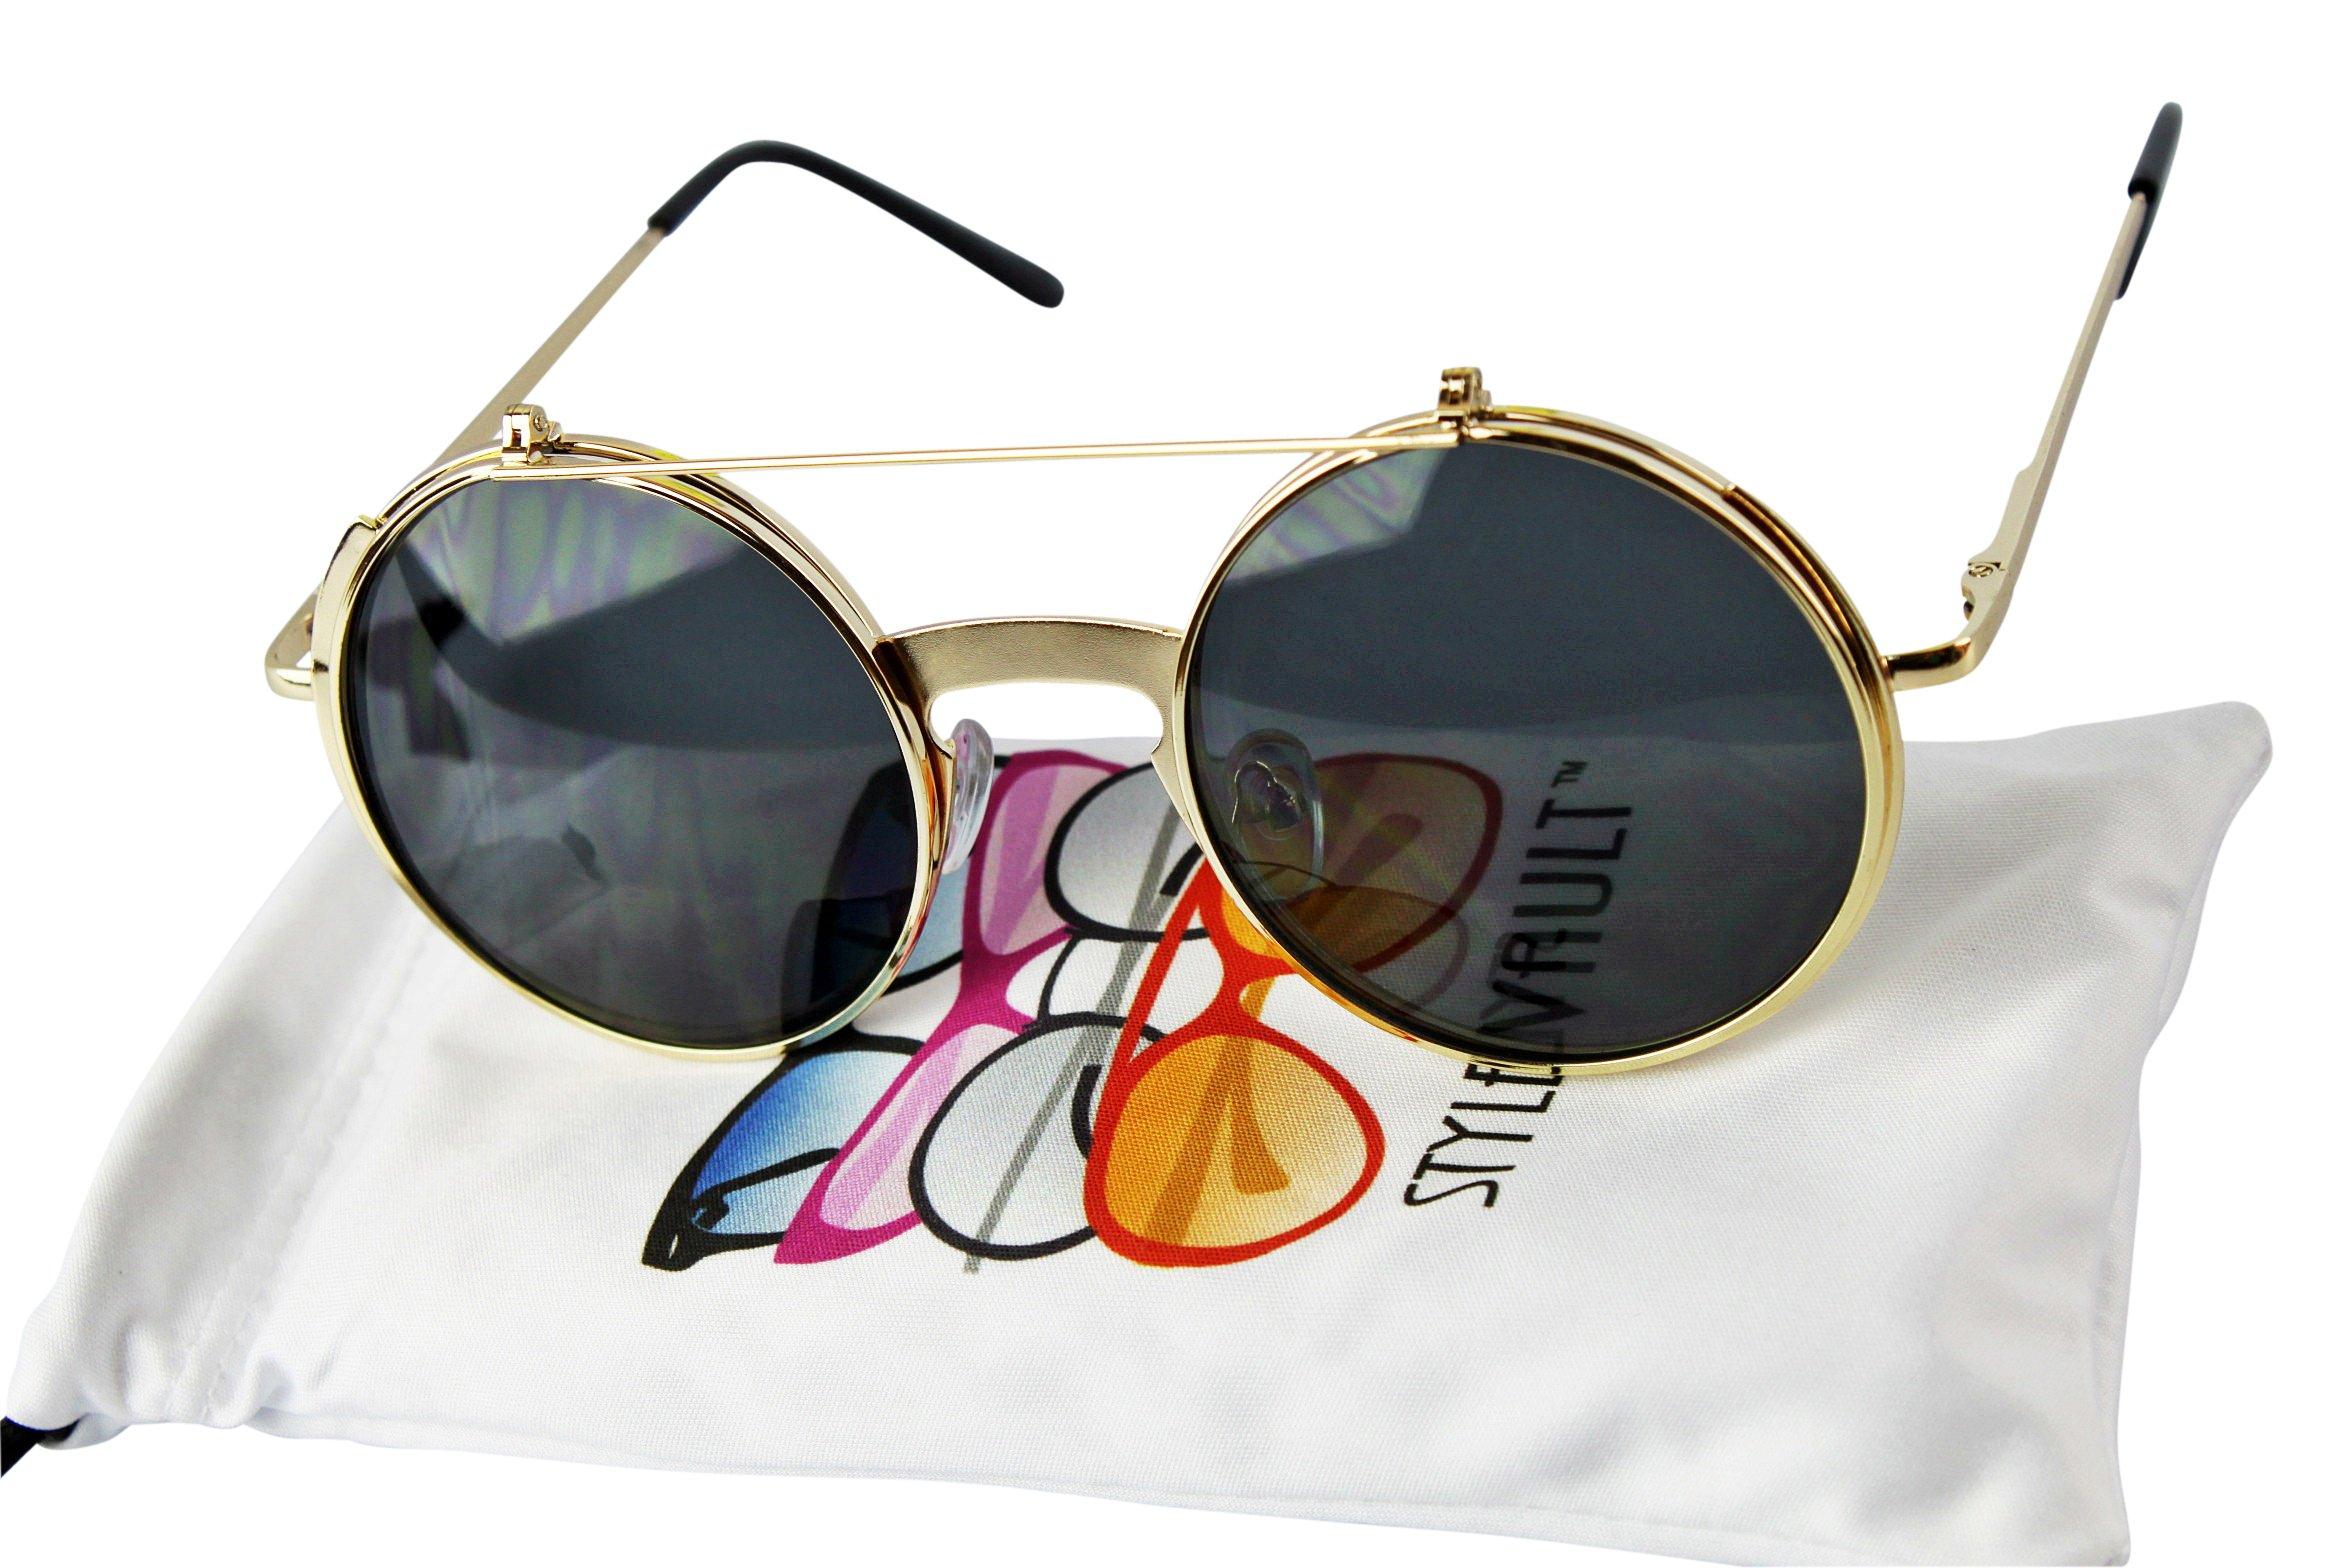 V135-vp Style Vault Round Flip up Django Steampunk Metal Sunglasses (C064 Gold, uv400)